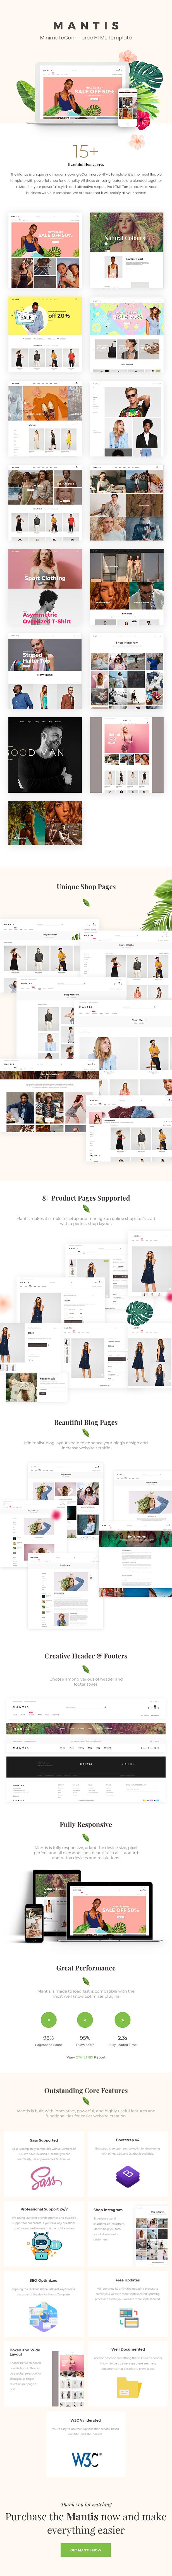 Mantis – Minimal eCommerce HTML Template - 1